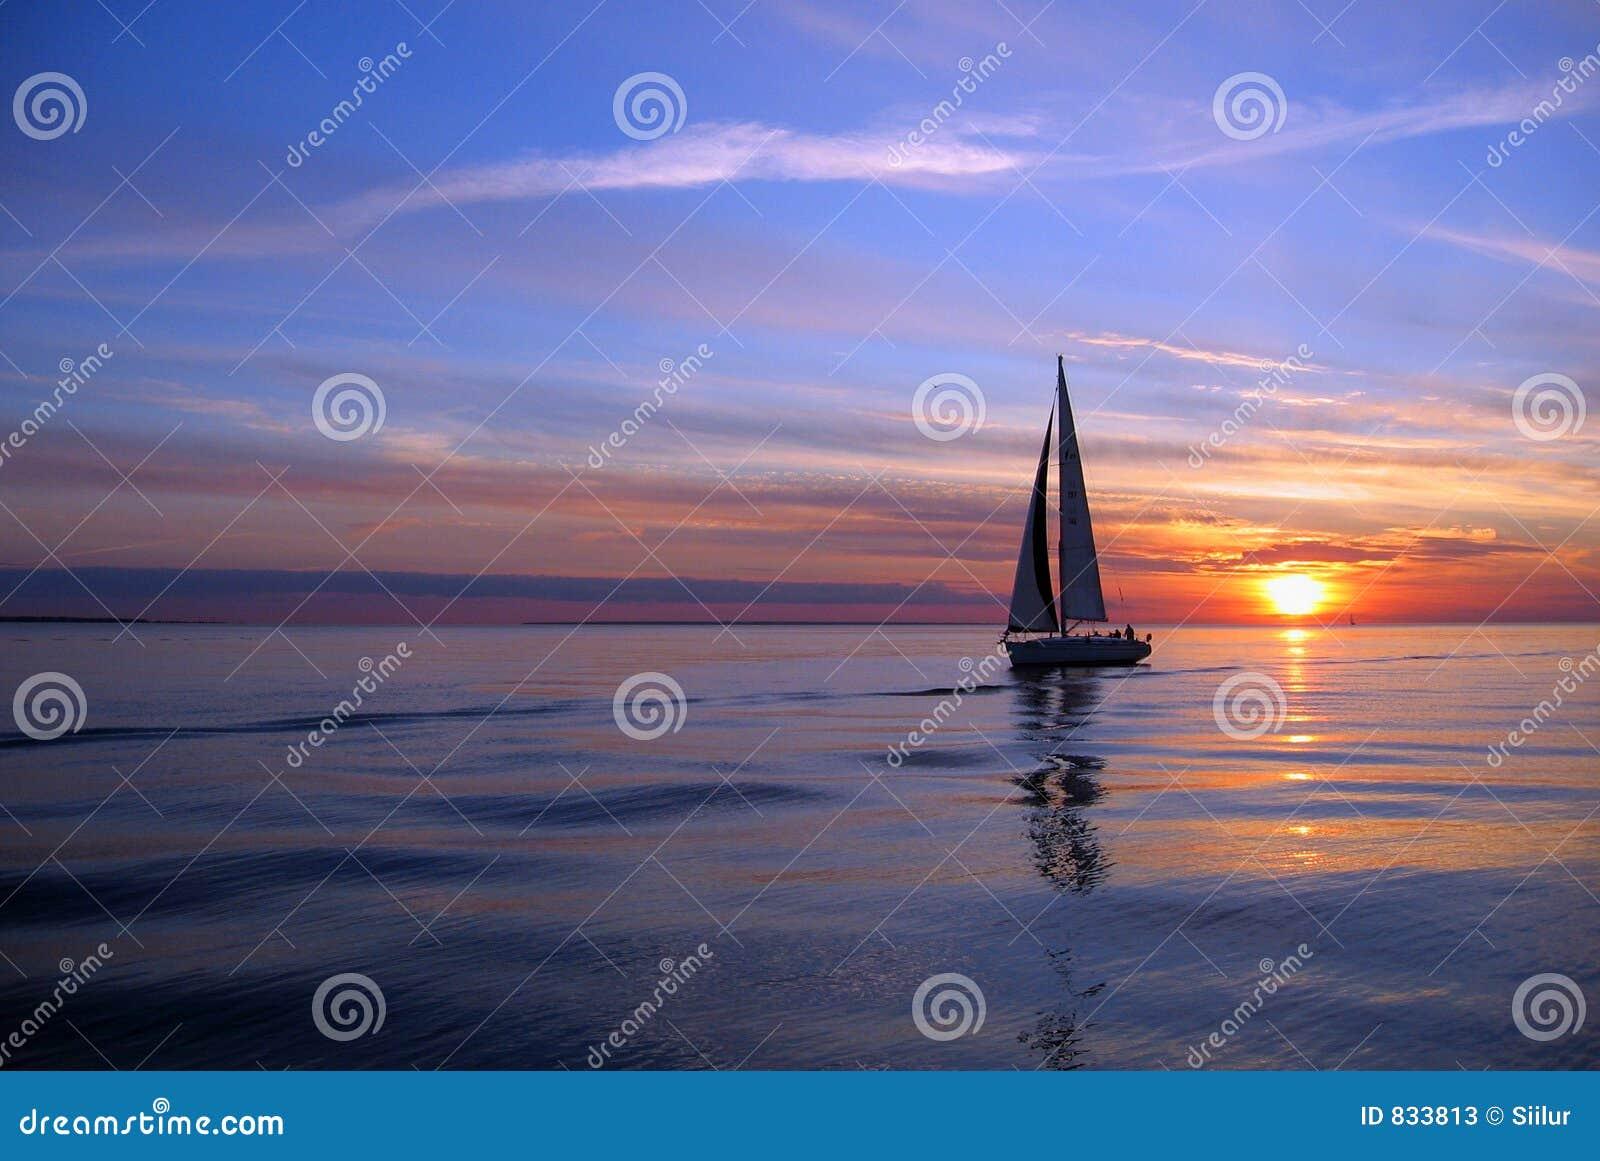 sunset sailing boats rocks - photo #44